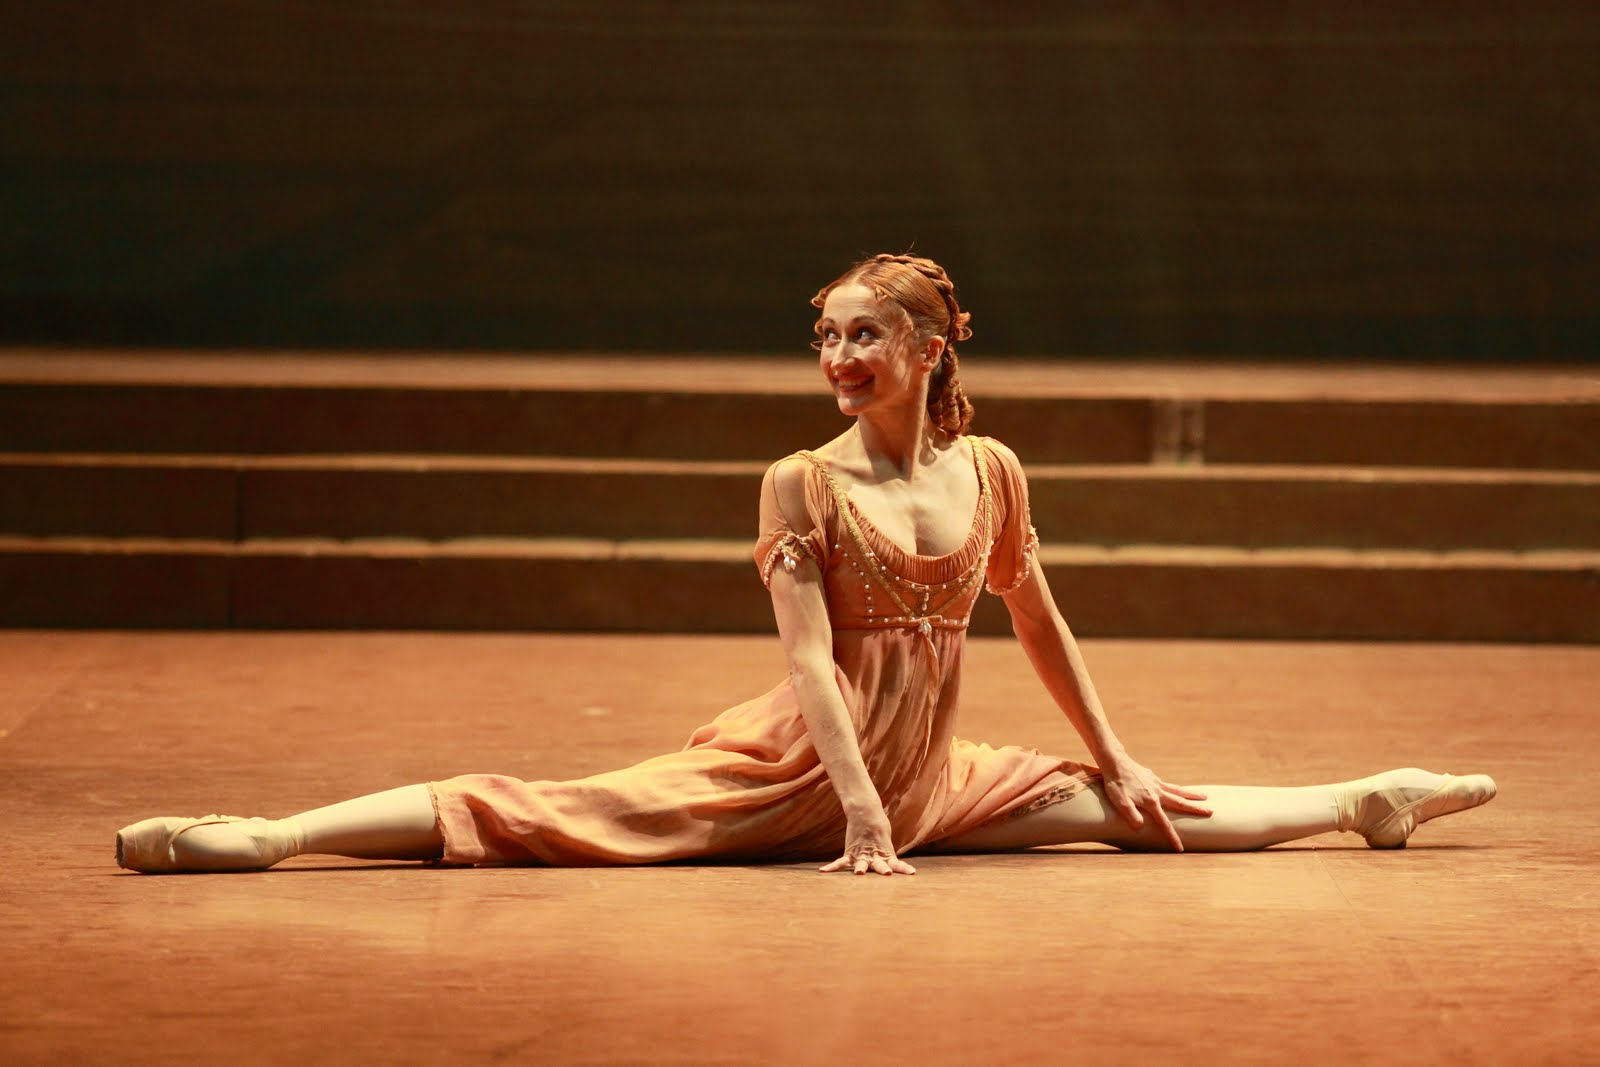 Daria Klimentova Prima Ballerina Of English National Ballet Talks To